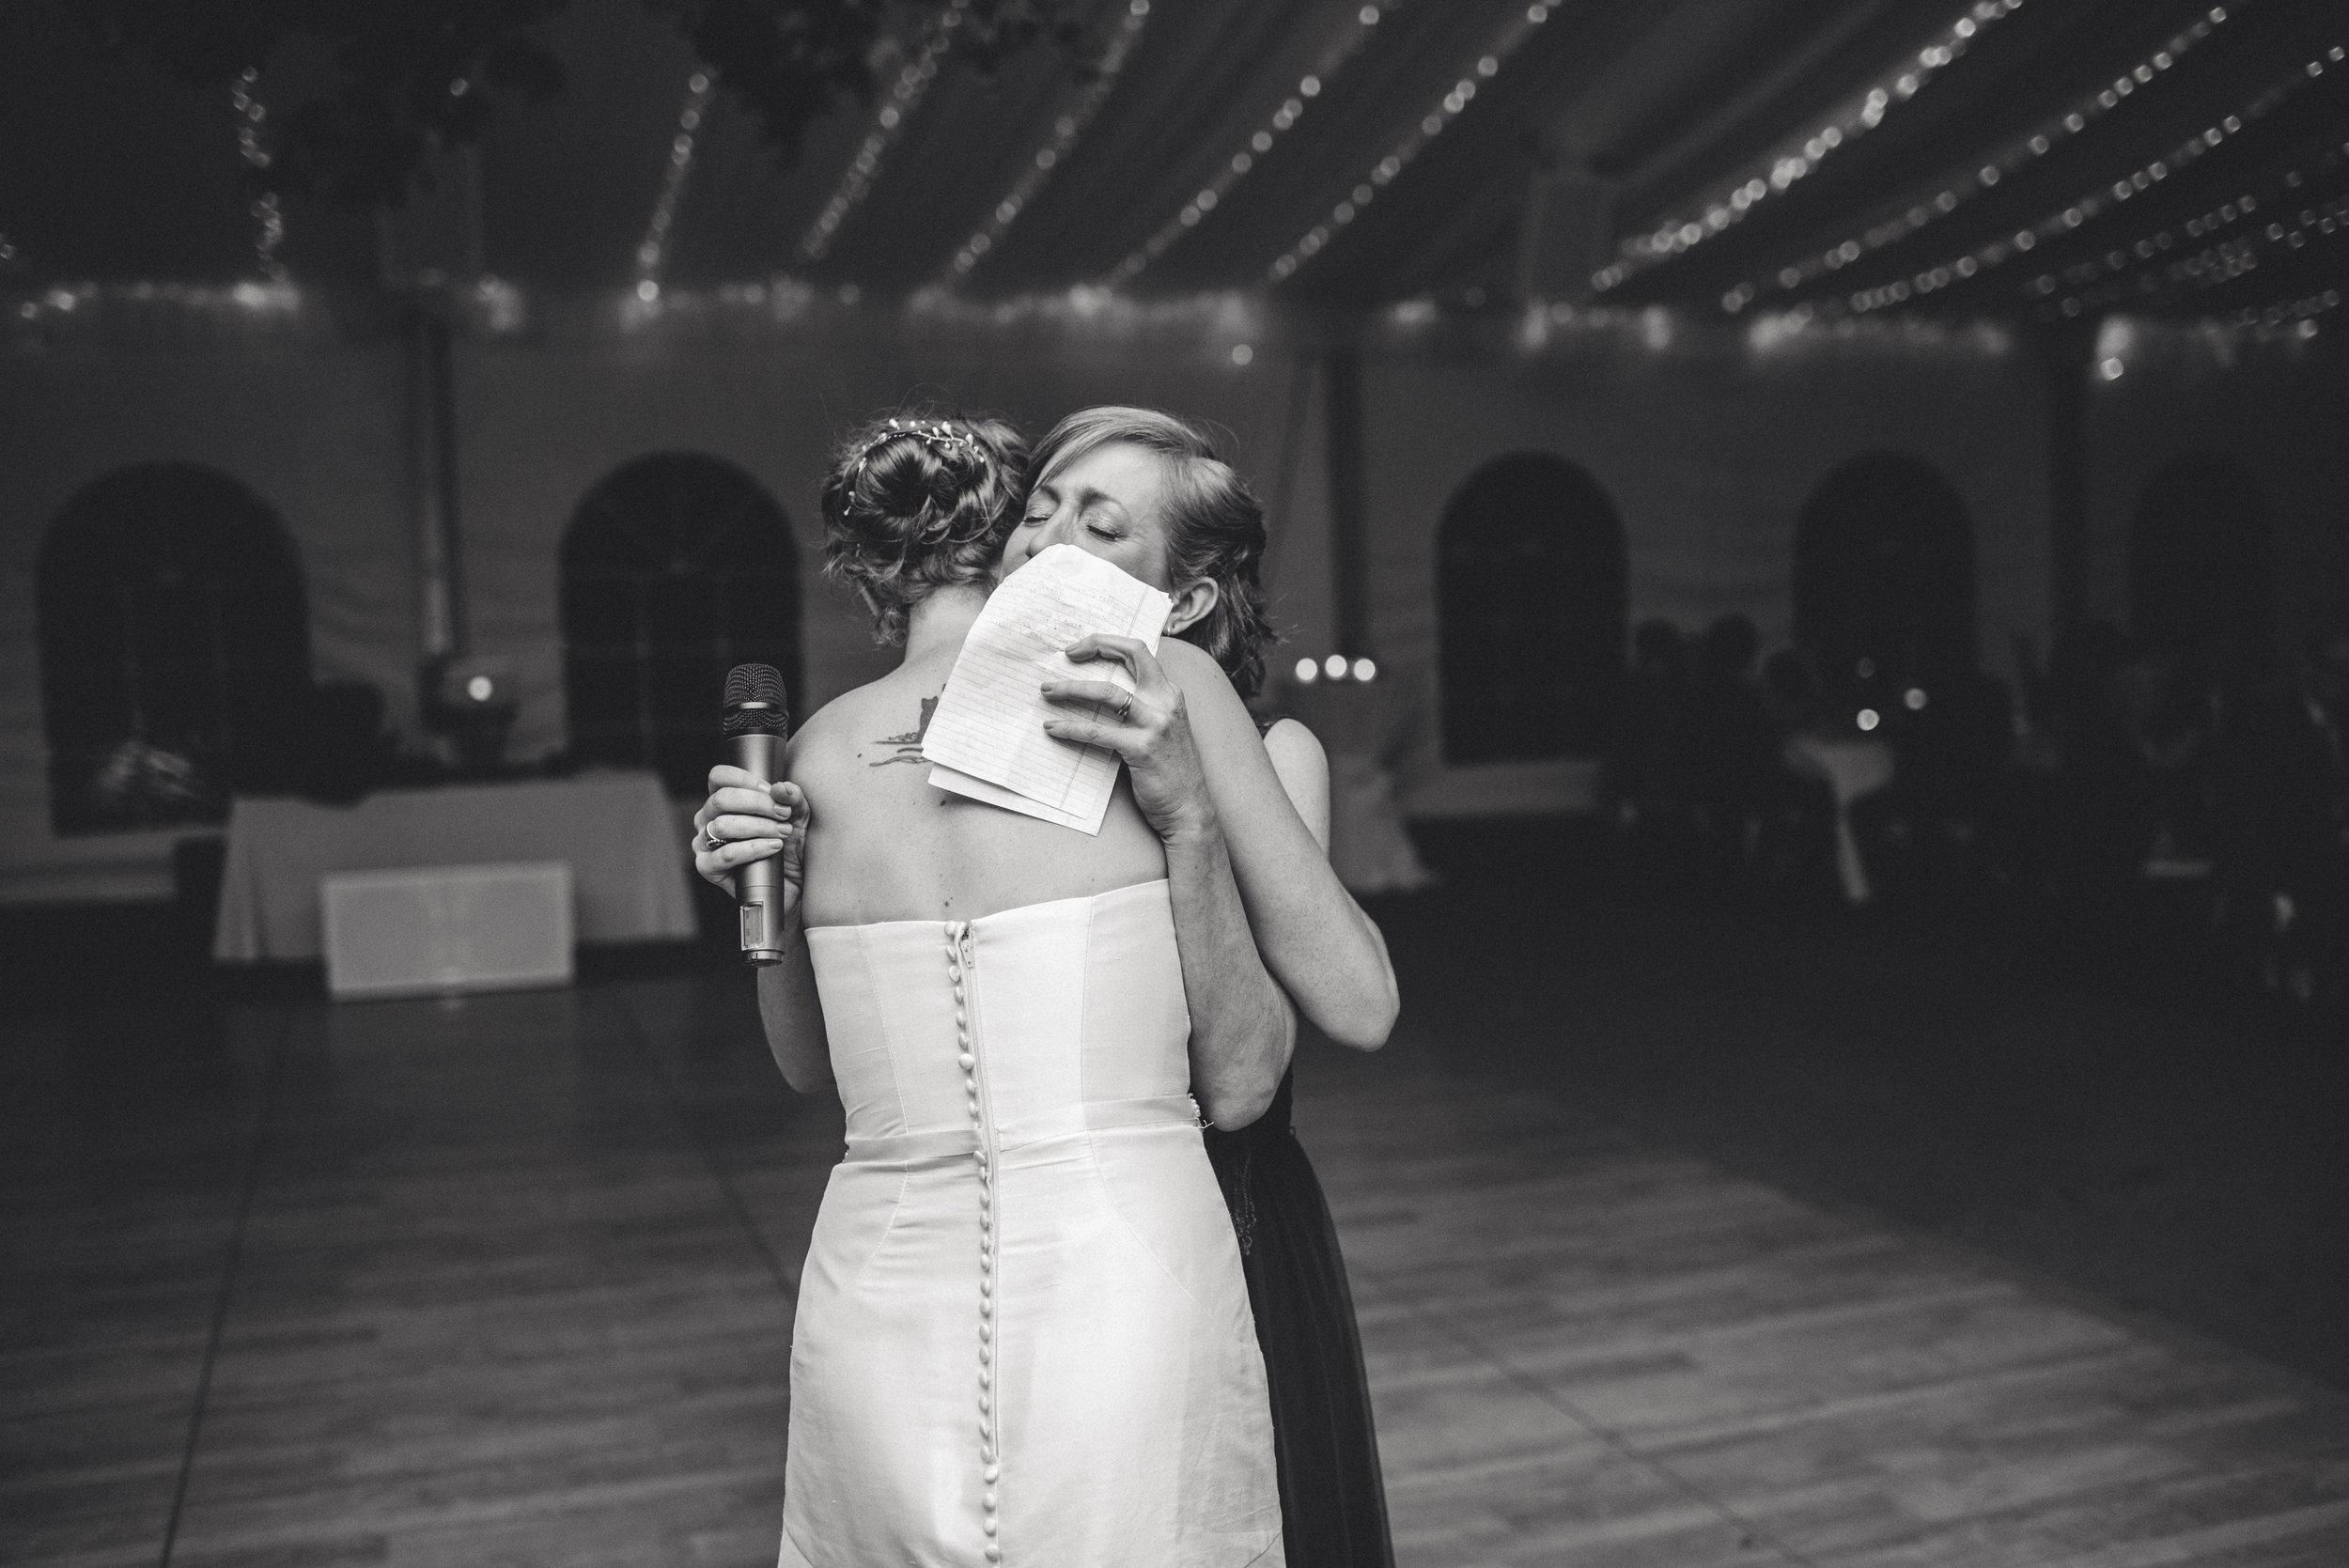 JACQUELINE & ANDREW WARSHAWER -BROOKMILL FARM FALL WEDDING - INTIMATE WEDDING PHOTOGRAPHER - TWOTWENTY by CHI-CHI AGBIM-534.jpg